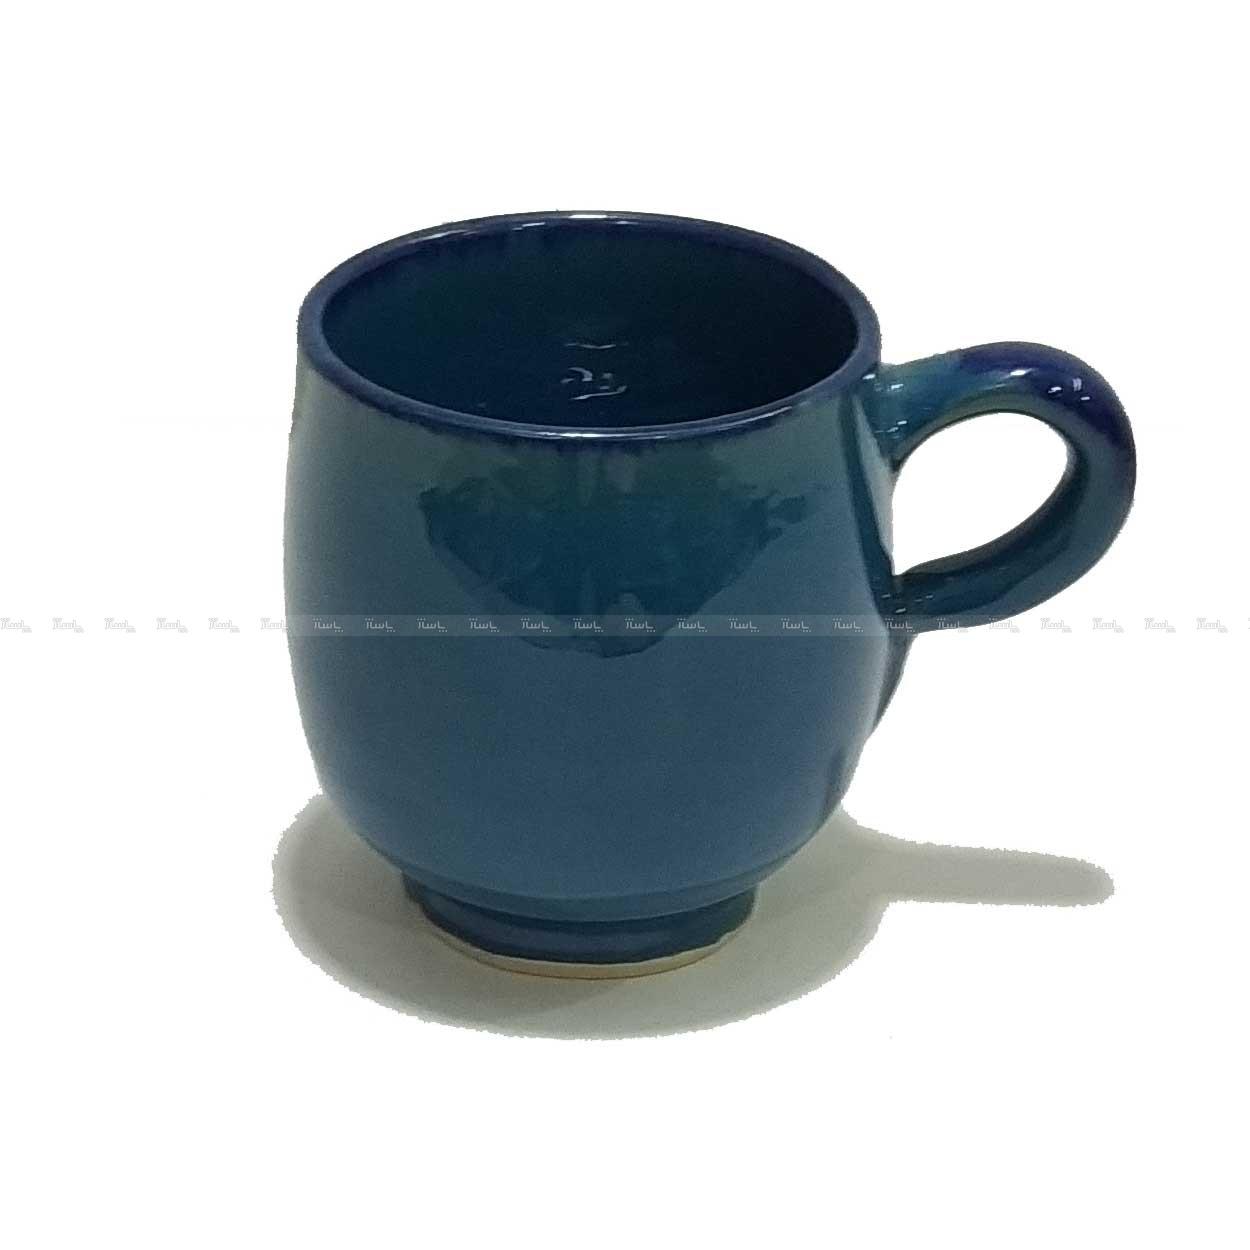 لیوان چای خوری سفالی-تصویر اصلی